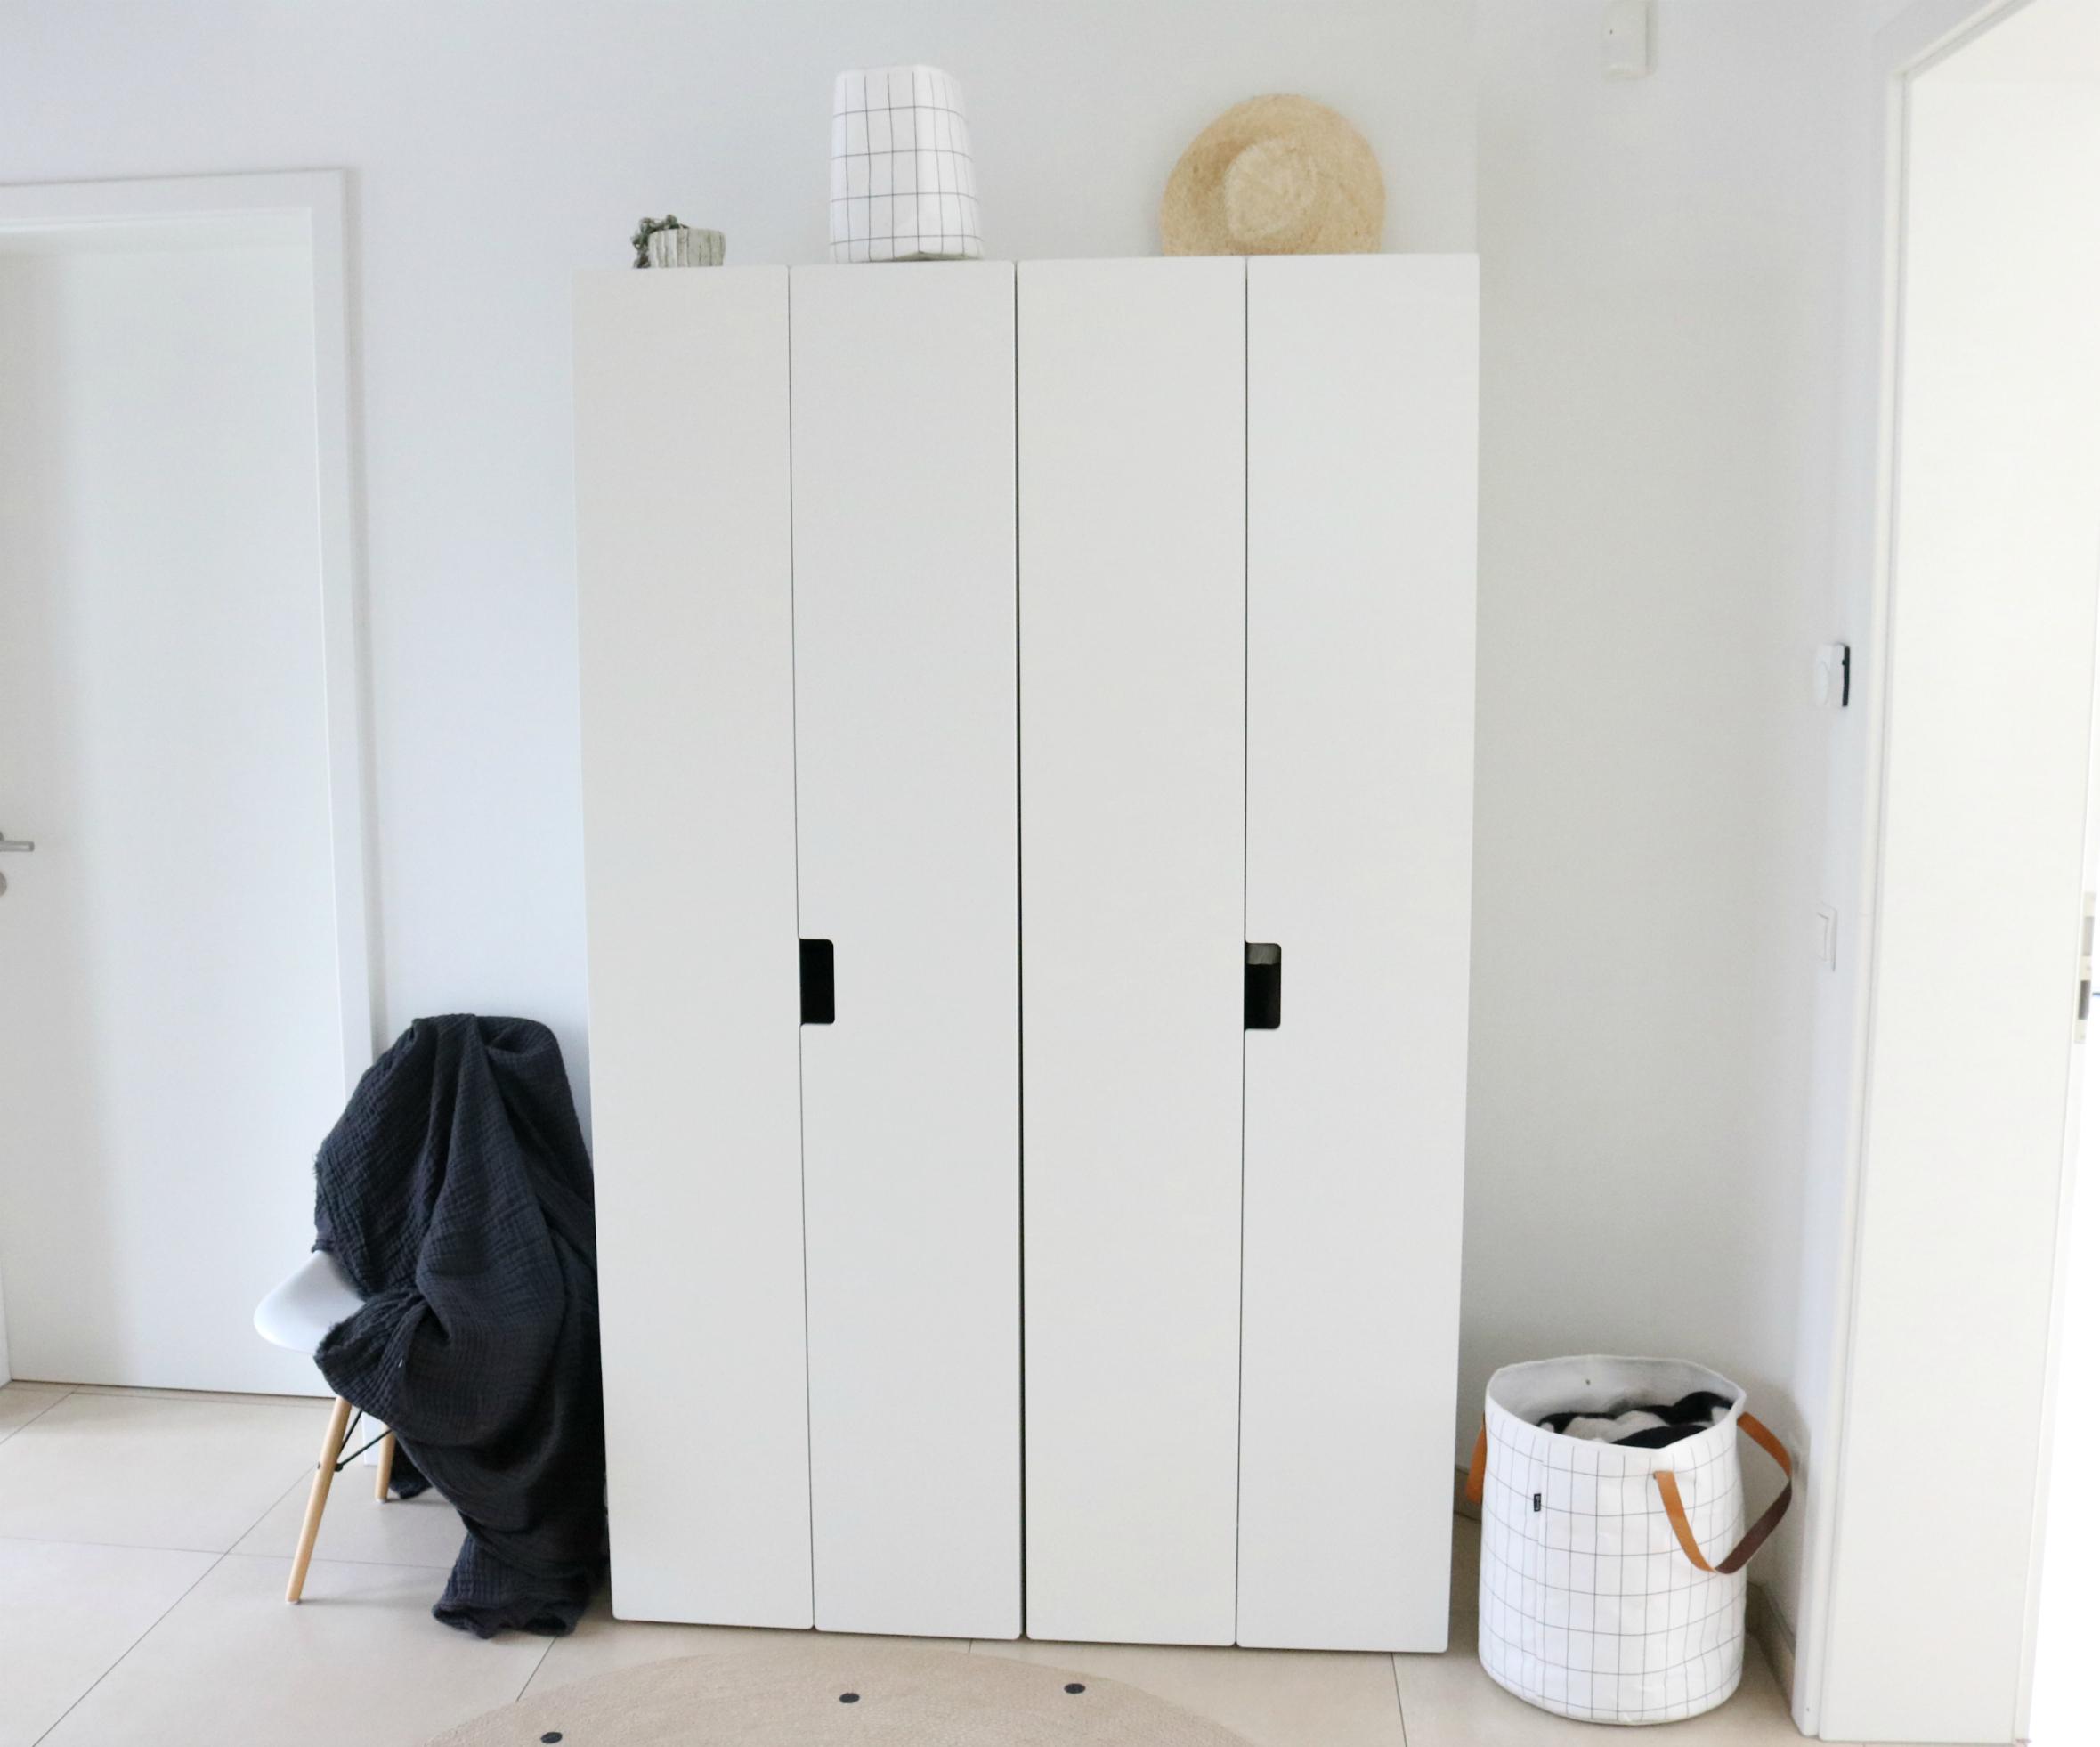 lifestylemommy interior unser neugestalteter flur. Black Bedroom Furniture Sets. Home Design Ideas